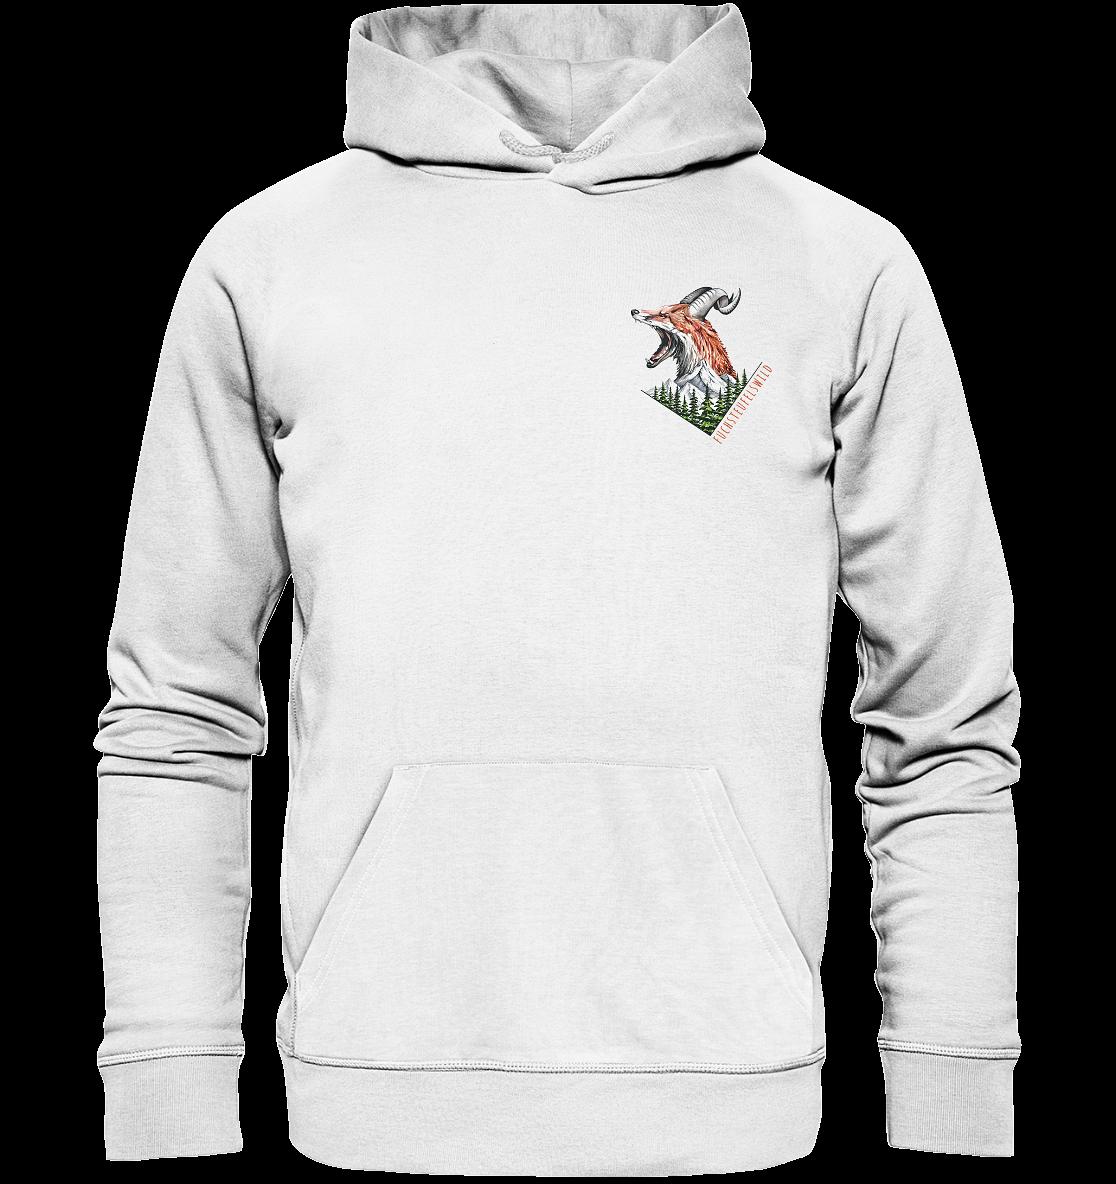 front-organic-hoodie-f8f8f8-1116x-1.png